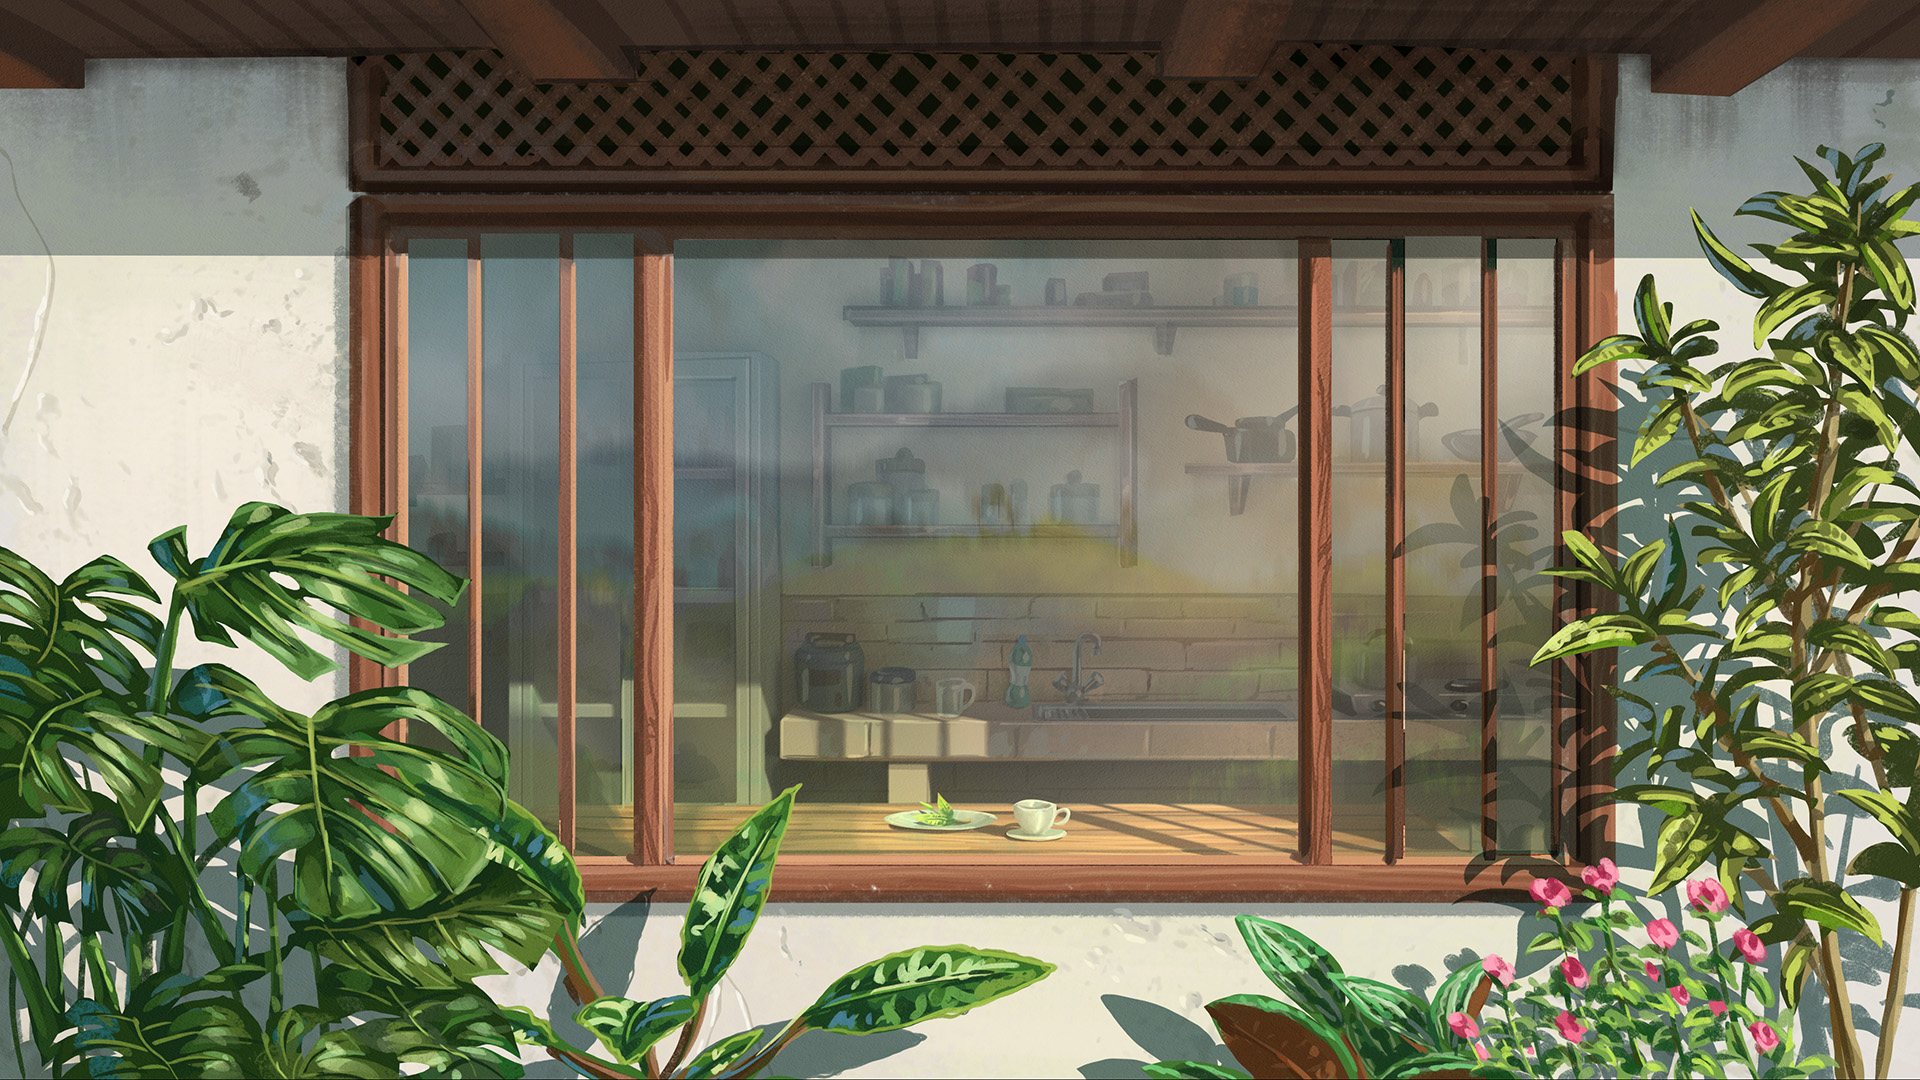 Gogo Tea: Kitchen Background